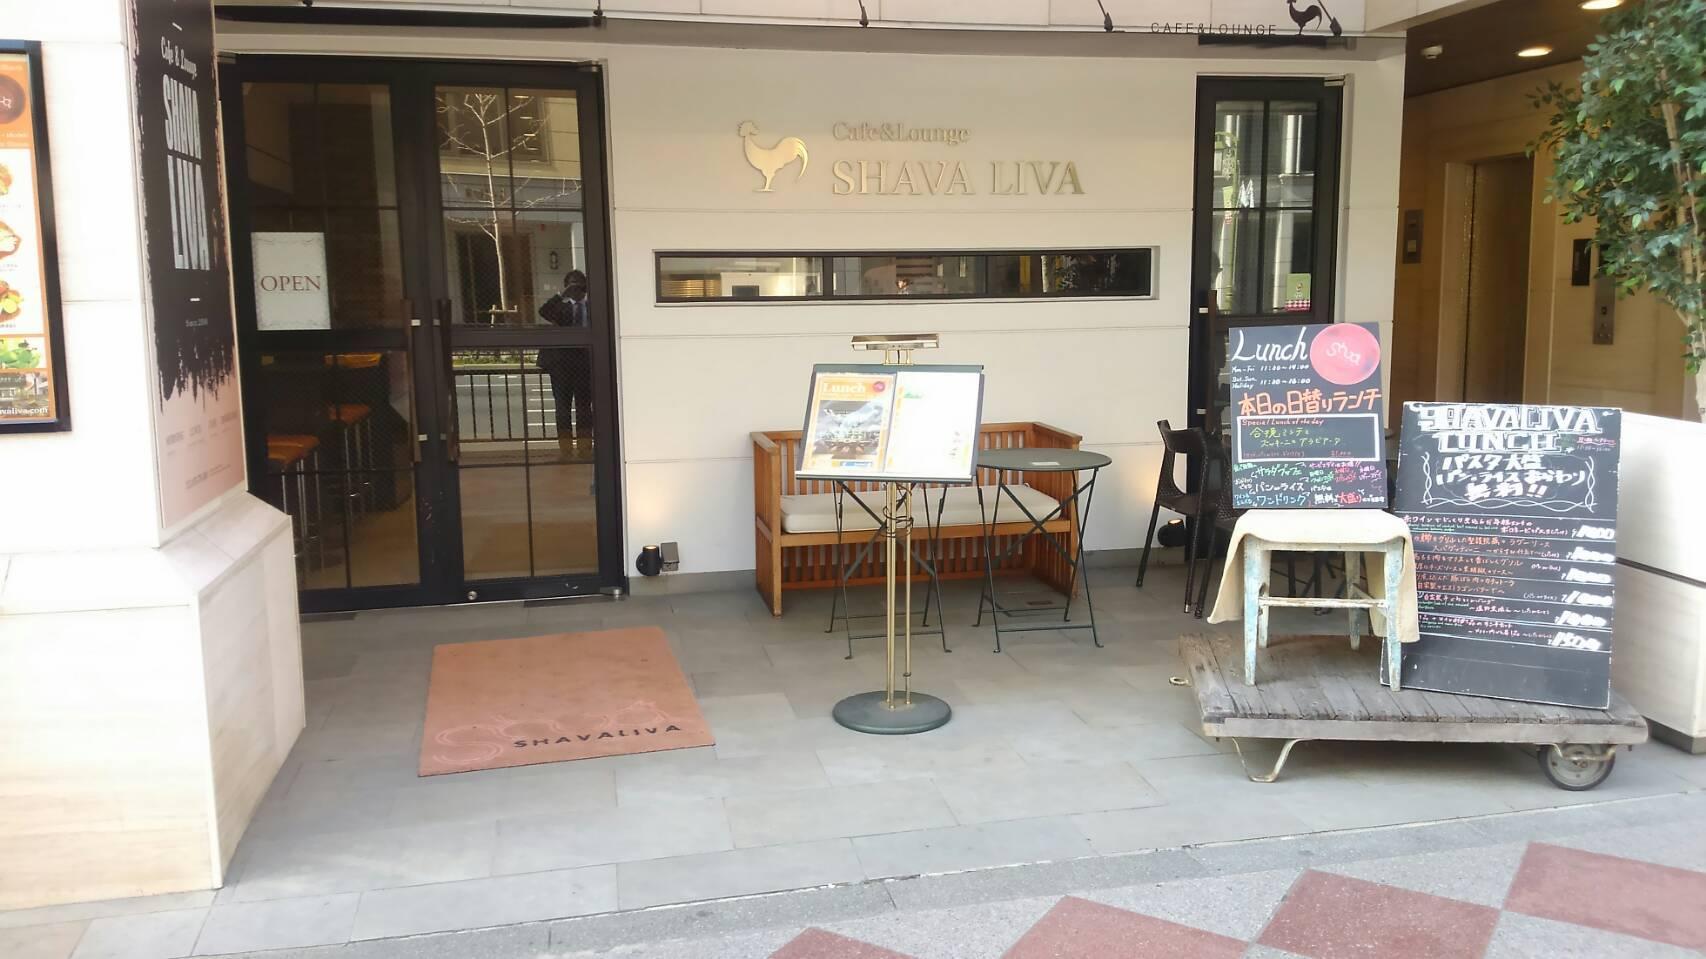 Cafe&Lounge SHAVA LIVA